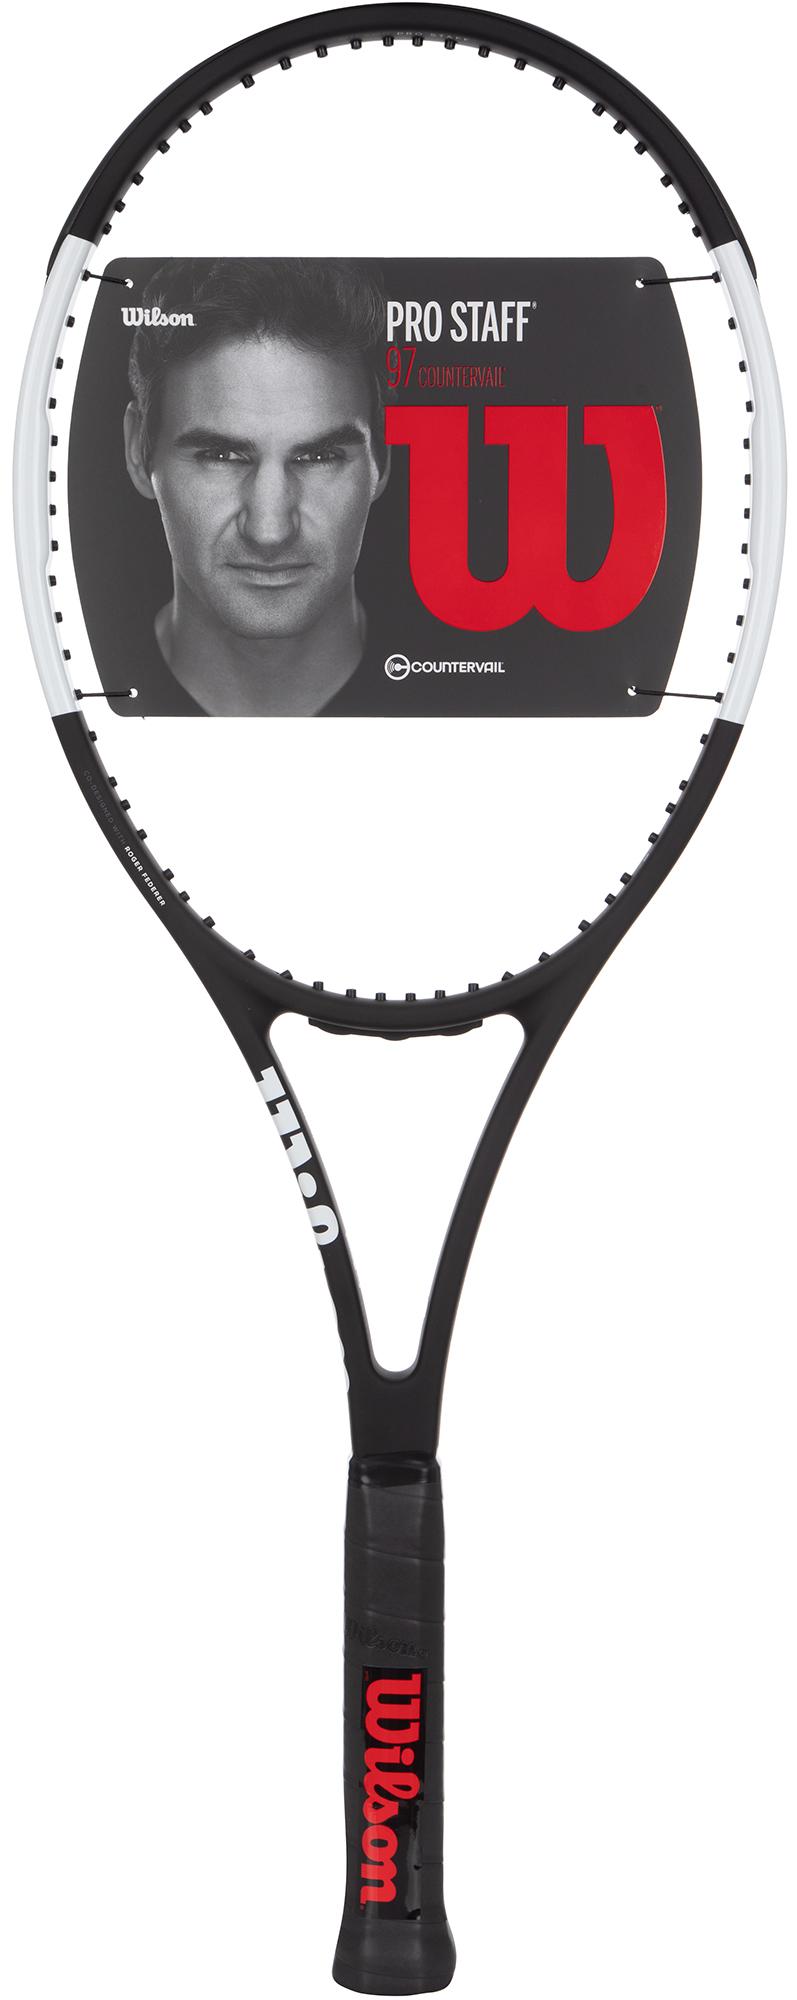 Wilson Ракетка для большого тенниса Pro Staff 97 Countervail